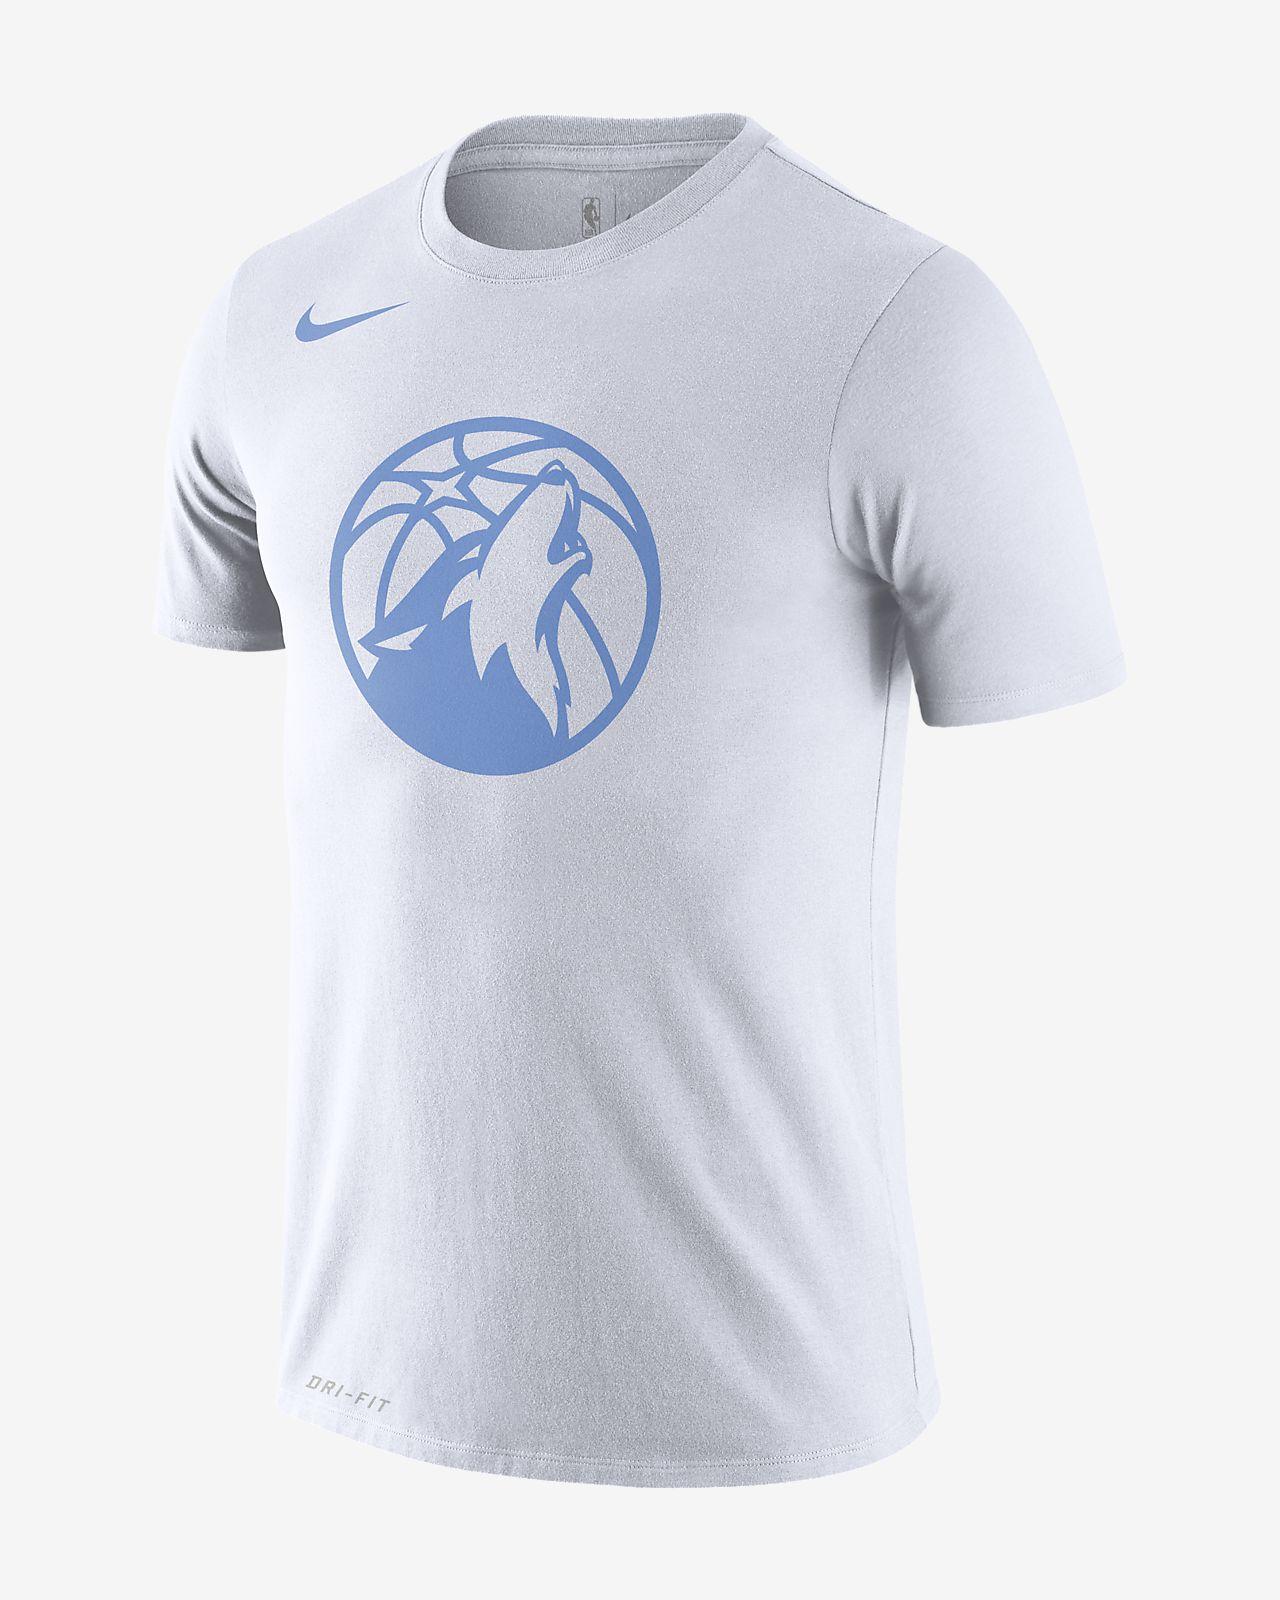 Timberwolves City Edition Logo Men S Nike Dri Fit Nba T Shirt Nike Ro